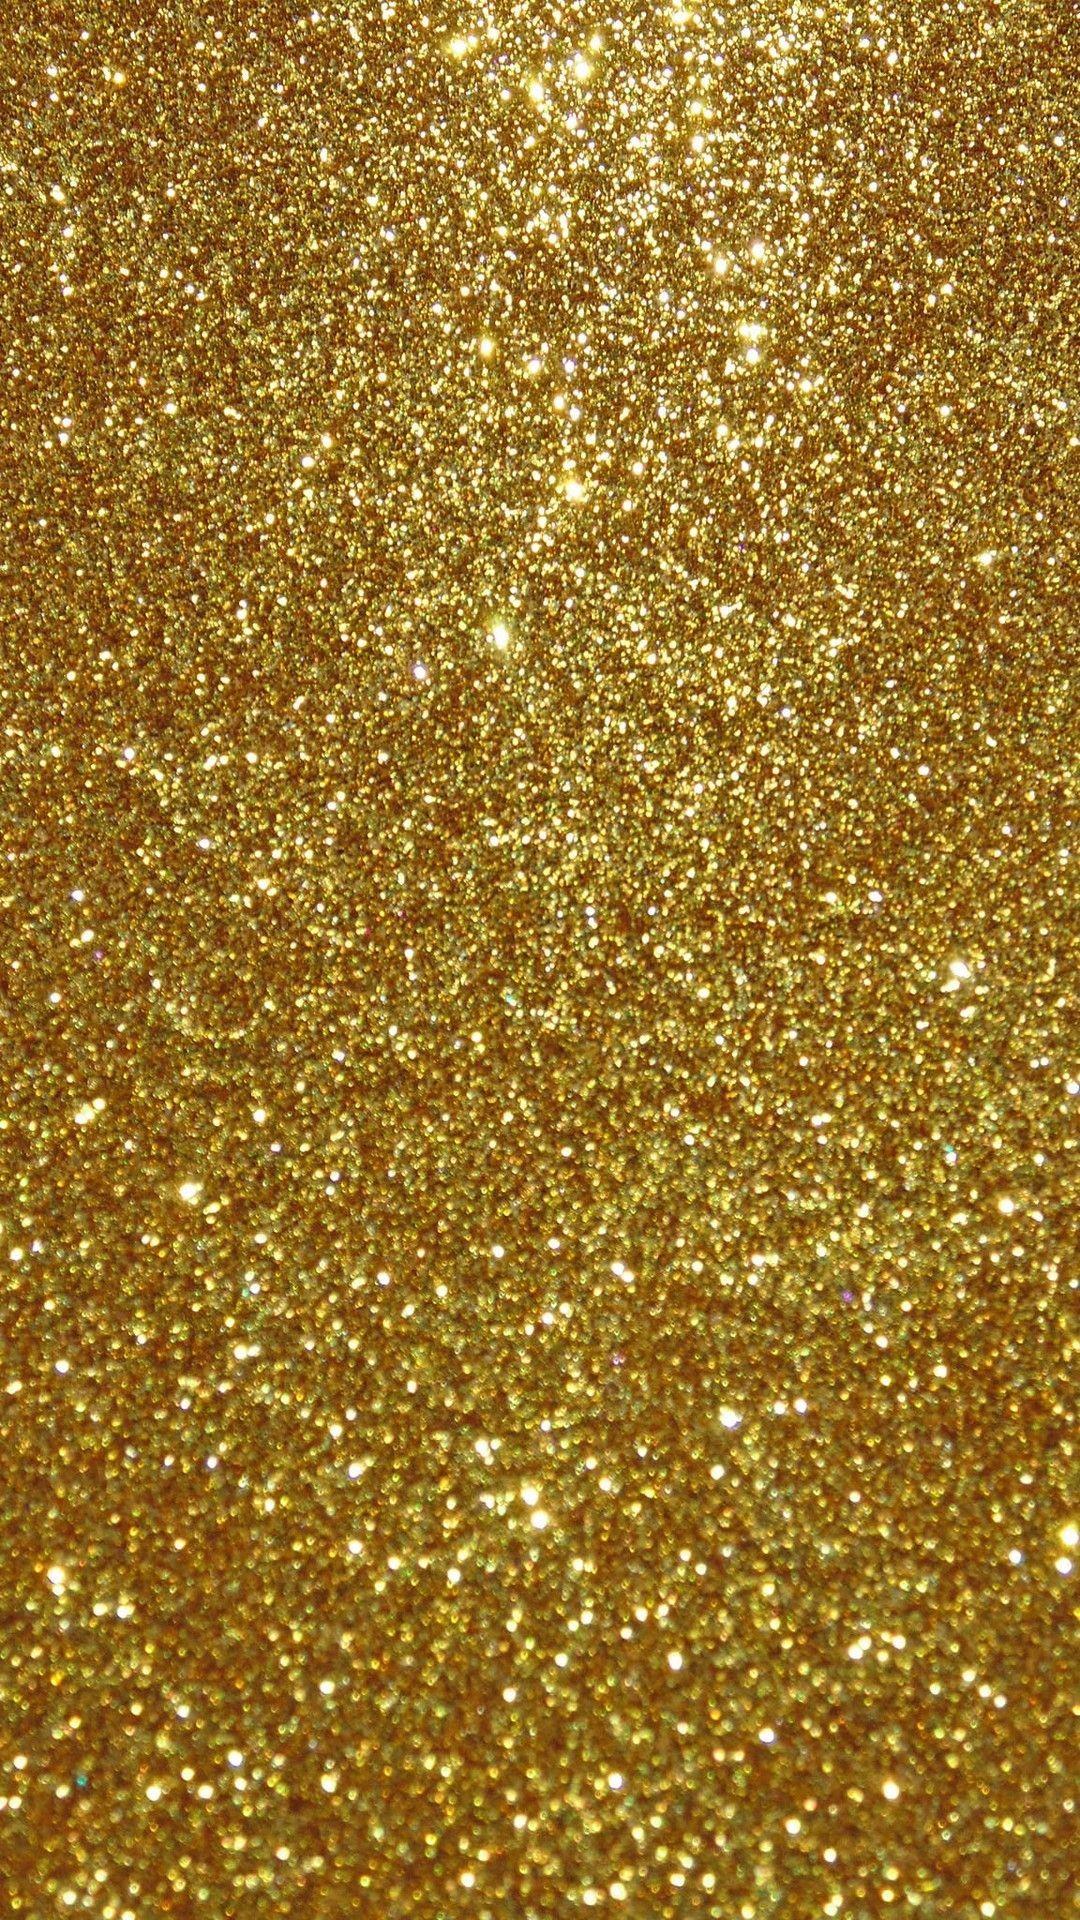 1080x1920, Gold Glitter Wallpaper For Iphone - Gold Glitter Wallpaper For Iphone - HD Wallpaper